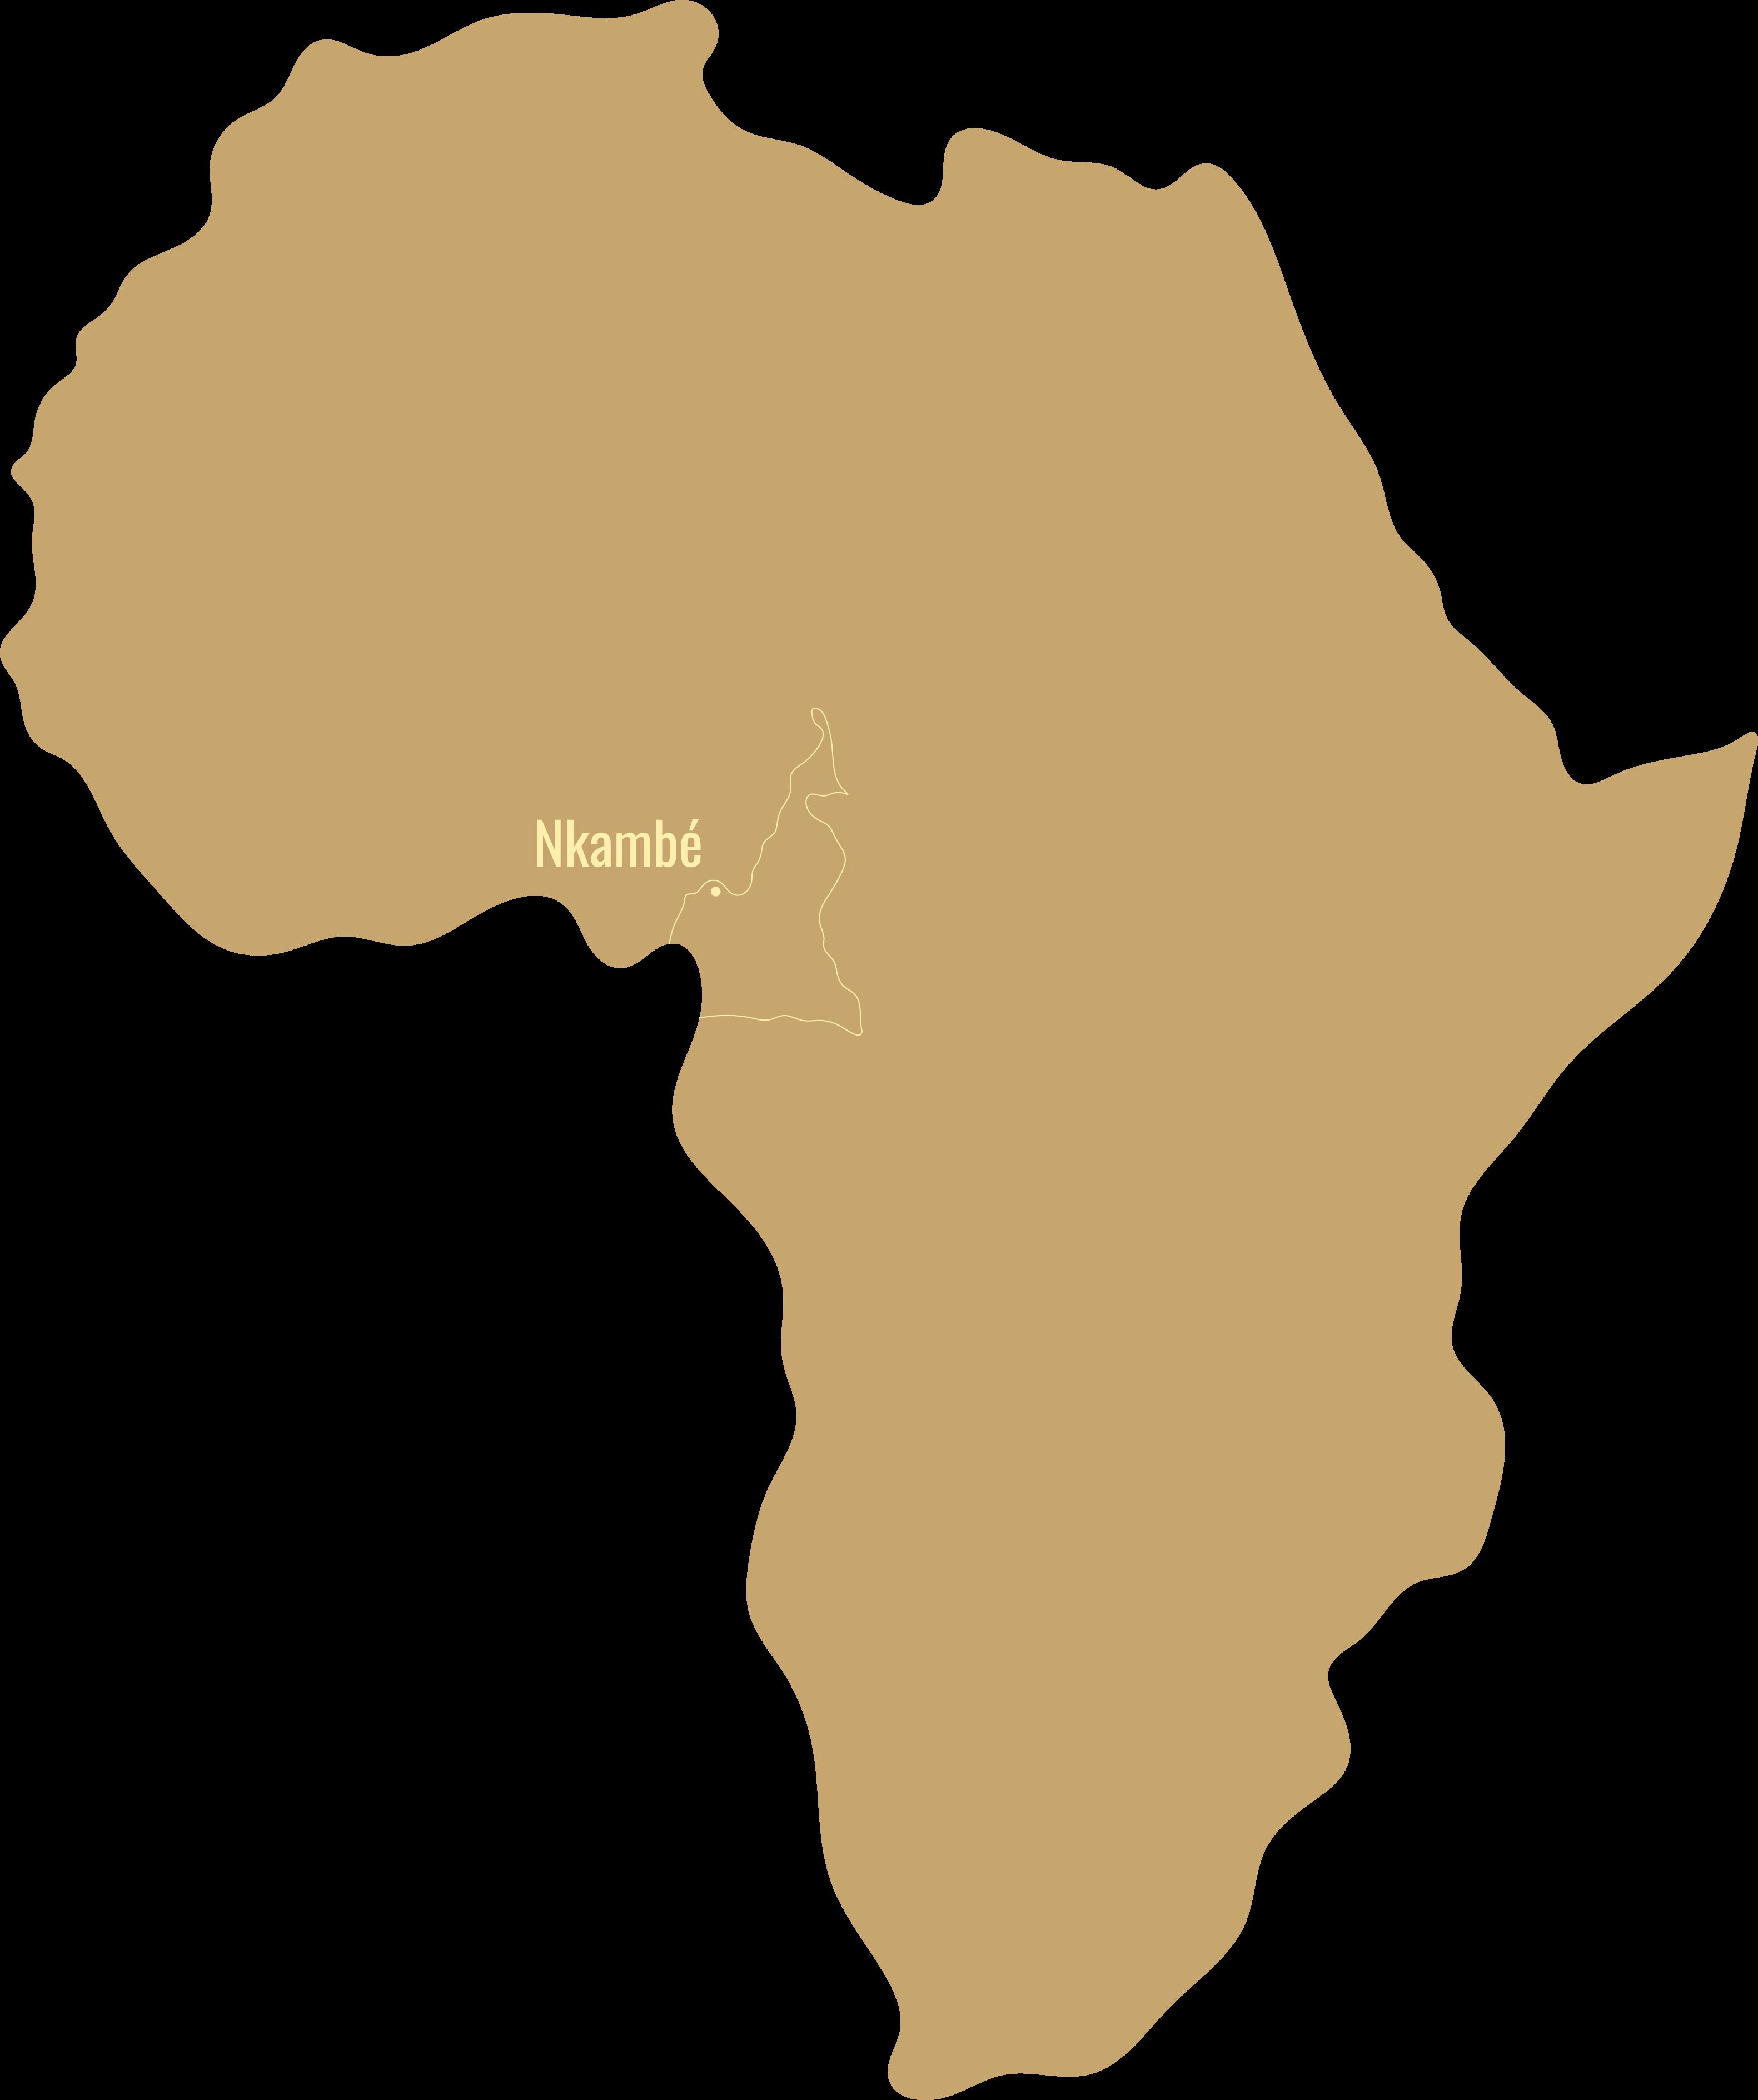 map_africa_nkambe